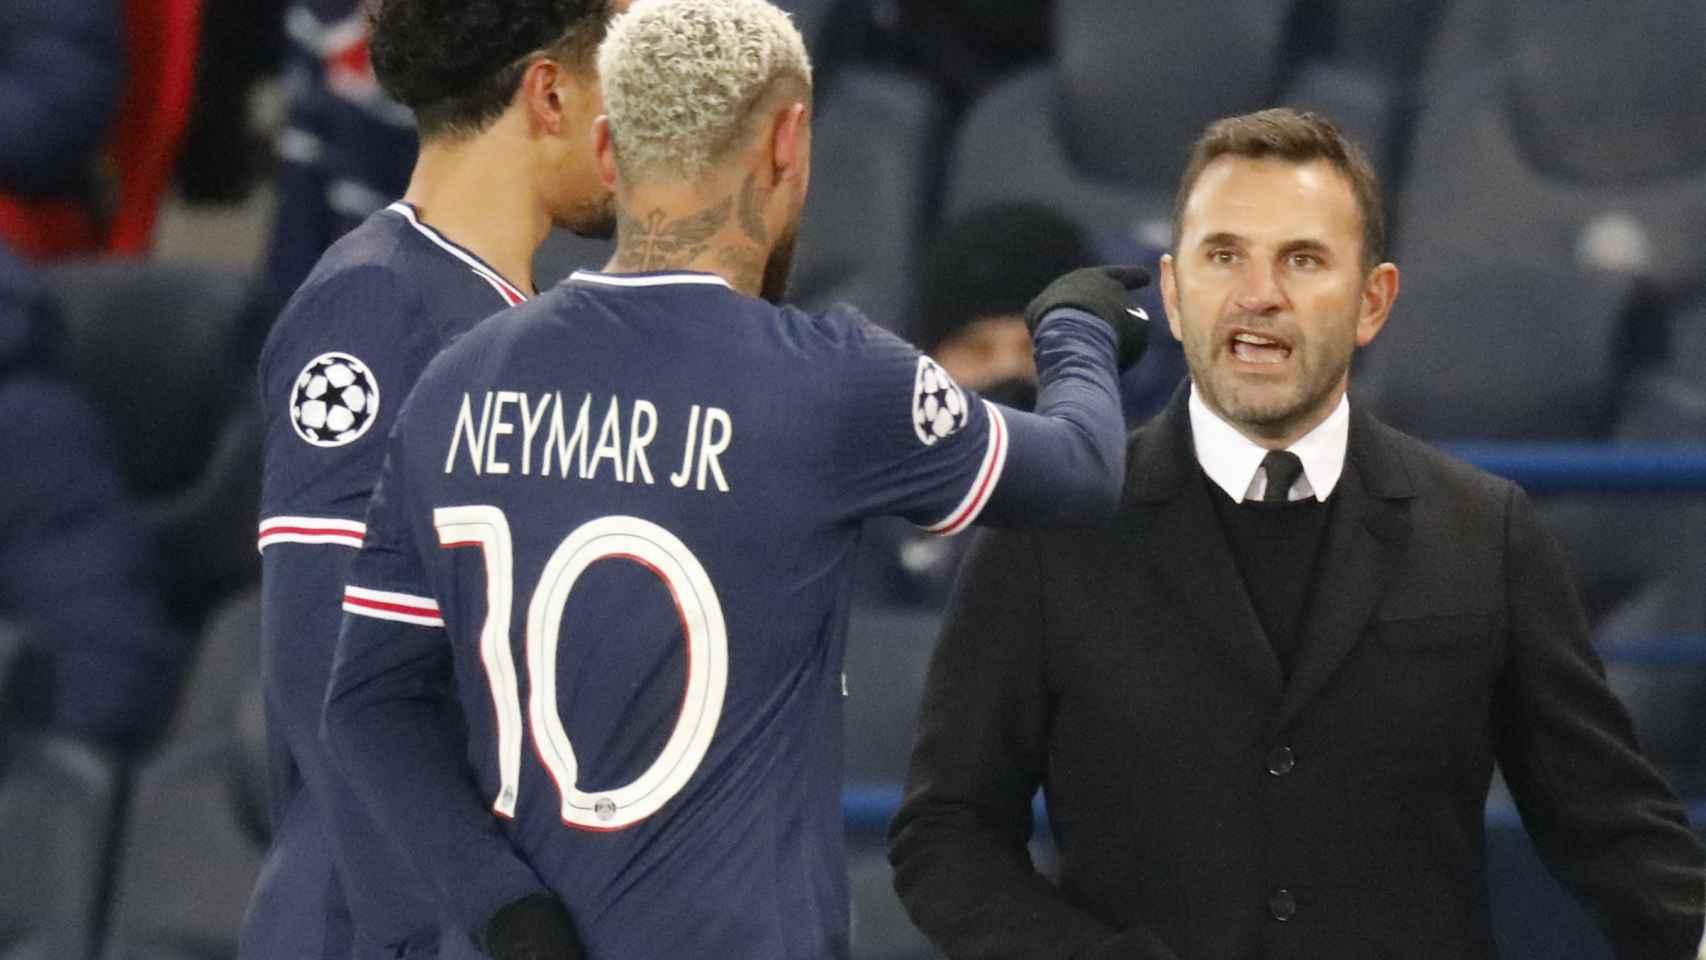 Neymar observando la tangana antes de retirarse